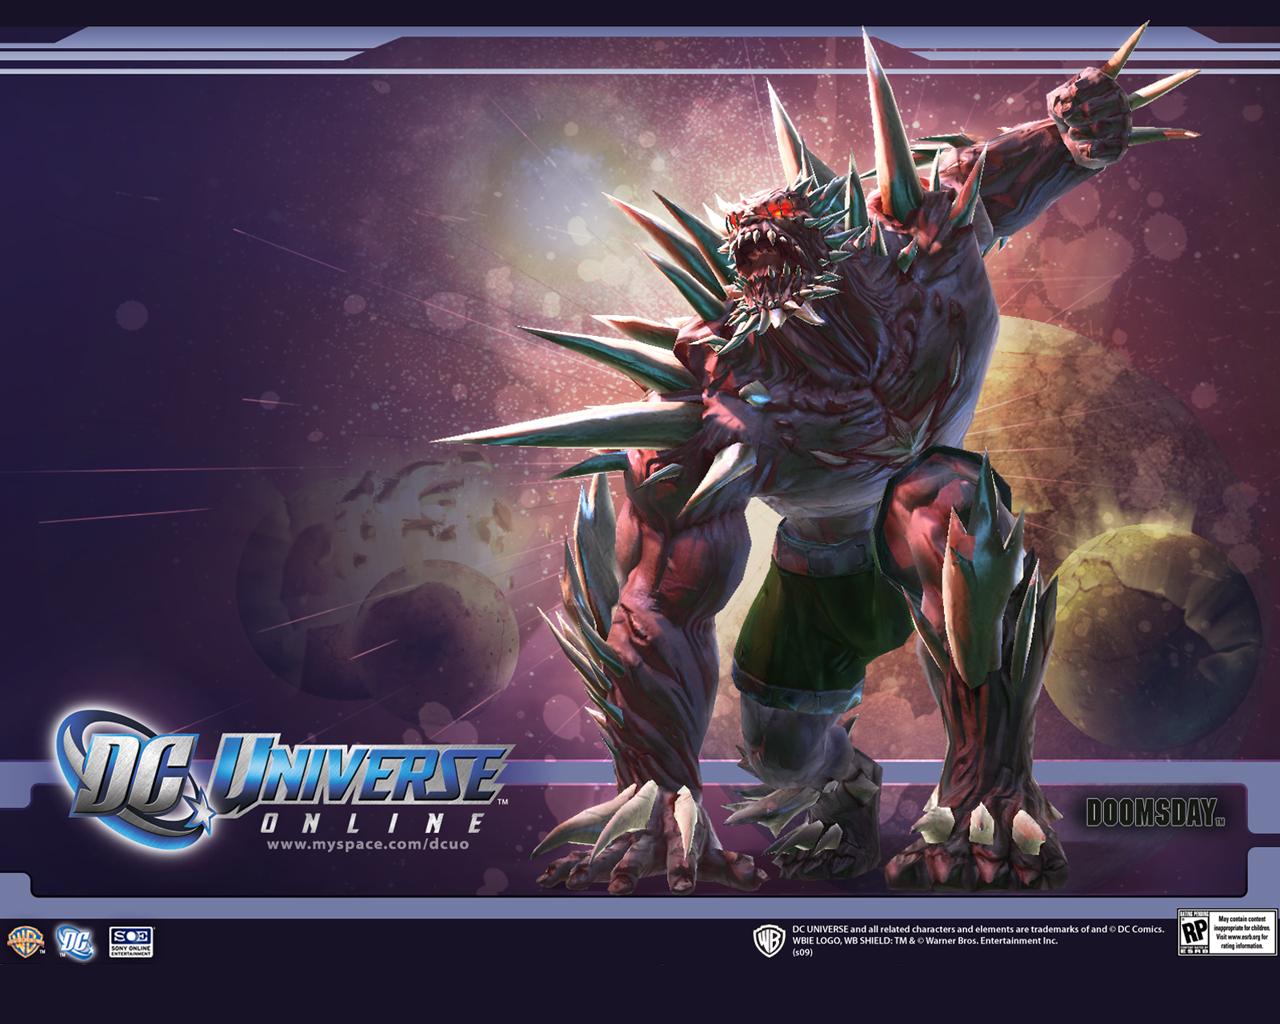 dc universe online wallpaper 9jpg 1280x1024